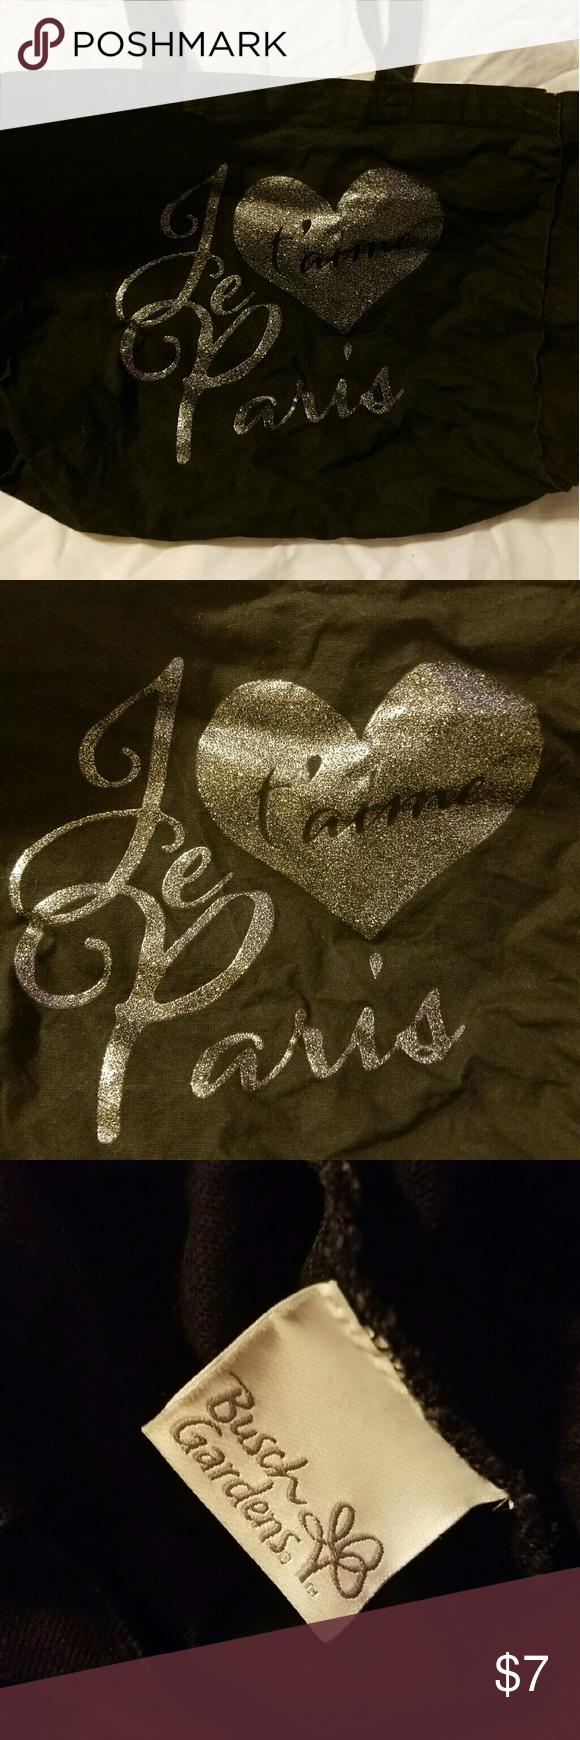 Je t\'aime Paris tote bag from Busch Gardens | My Posh Picks ...